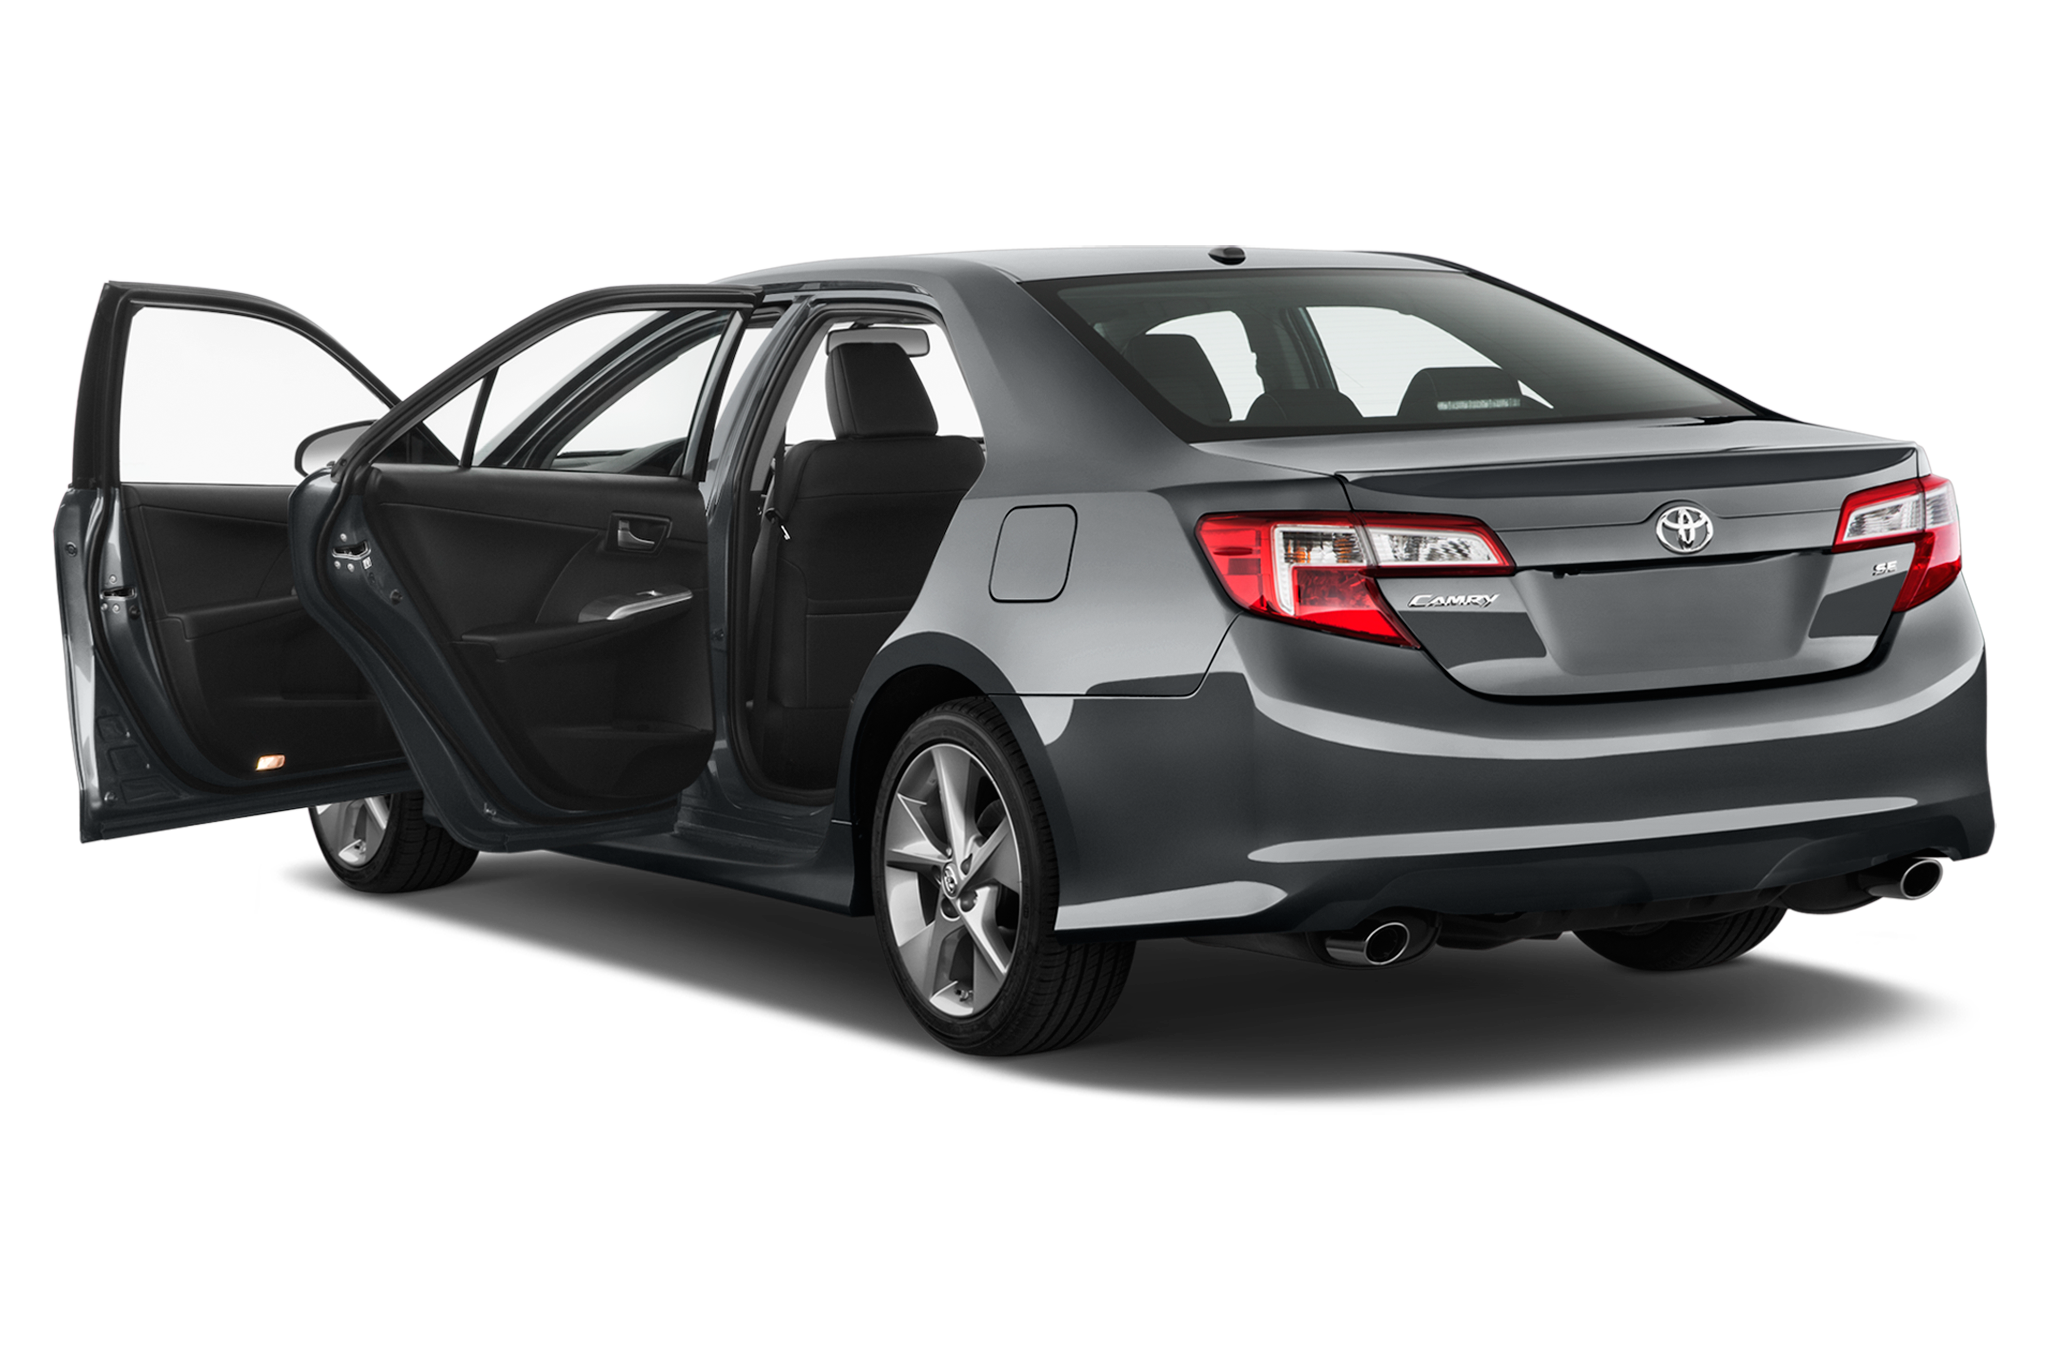 Toyota Camry: Doors